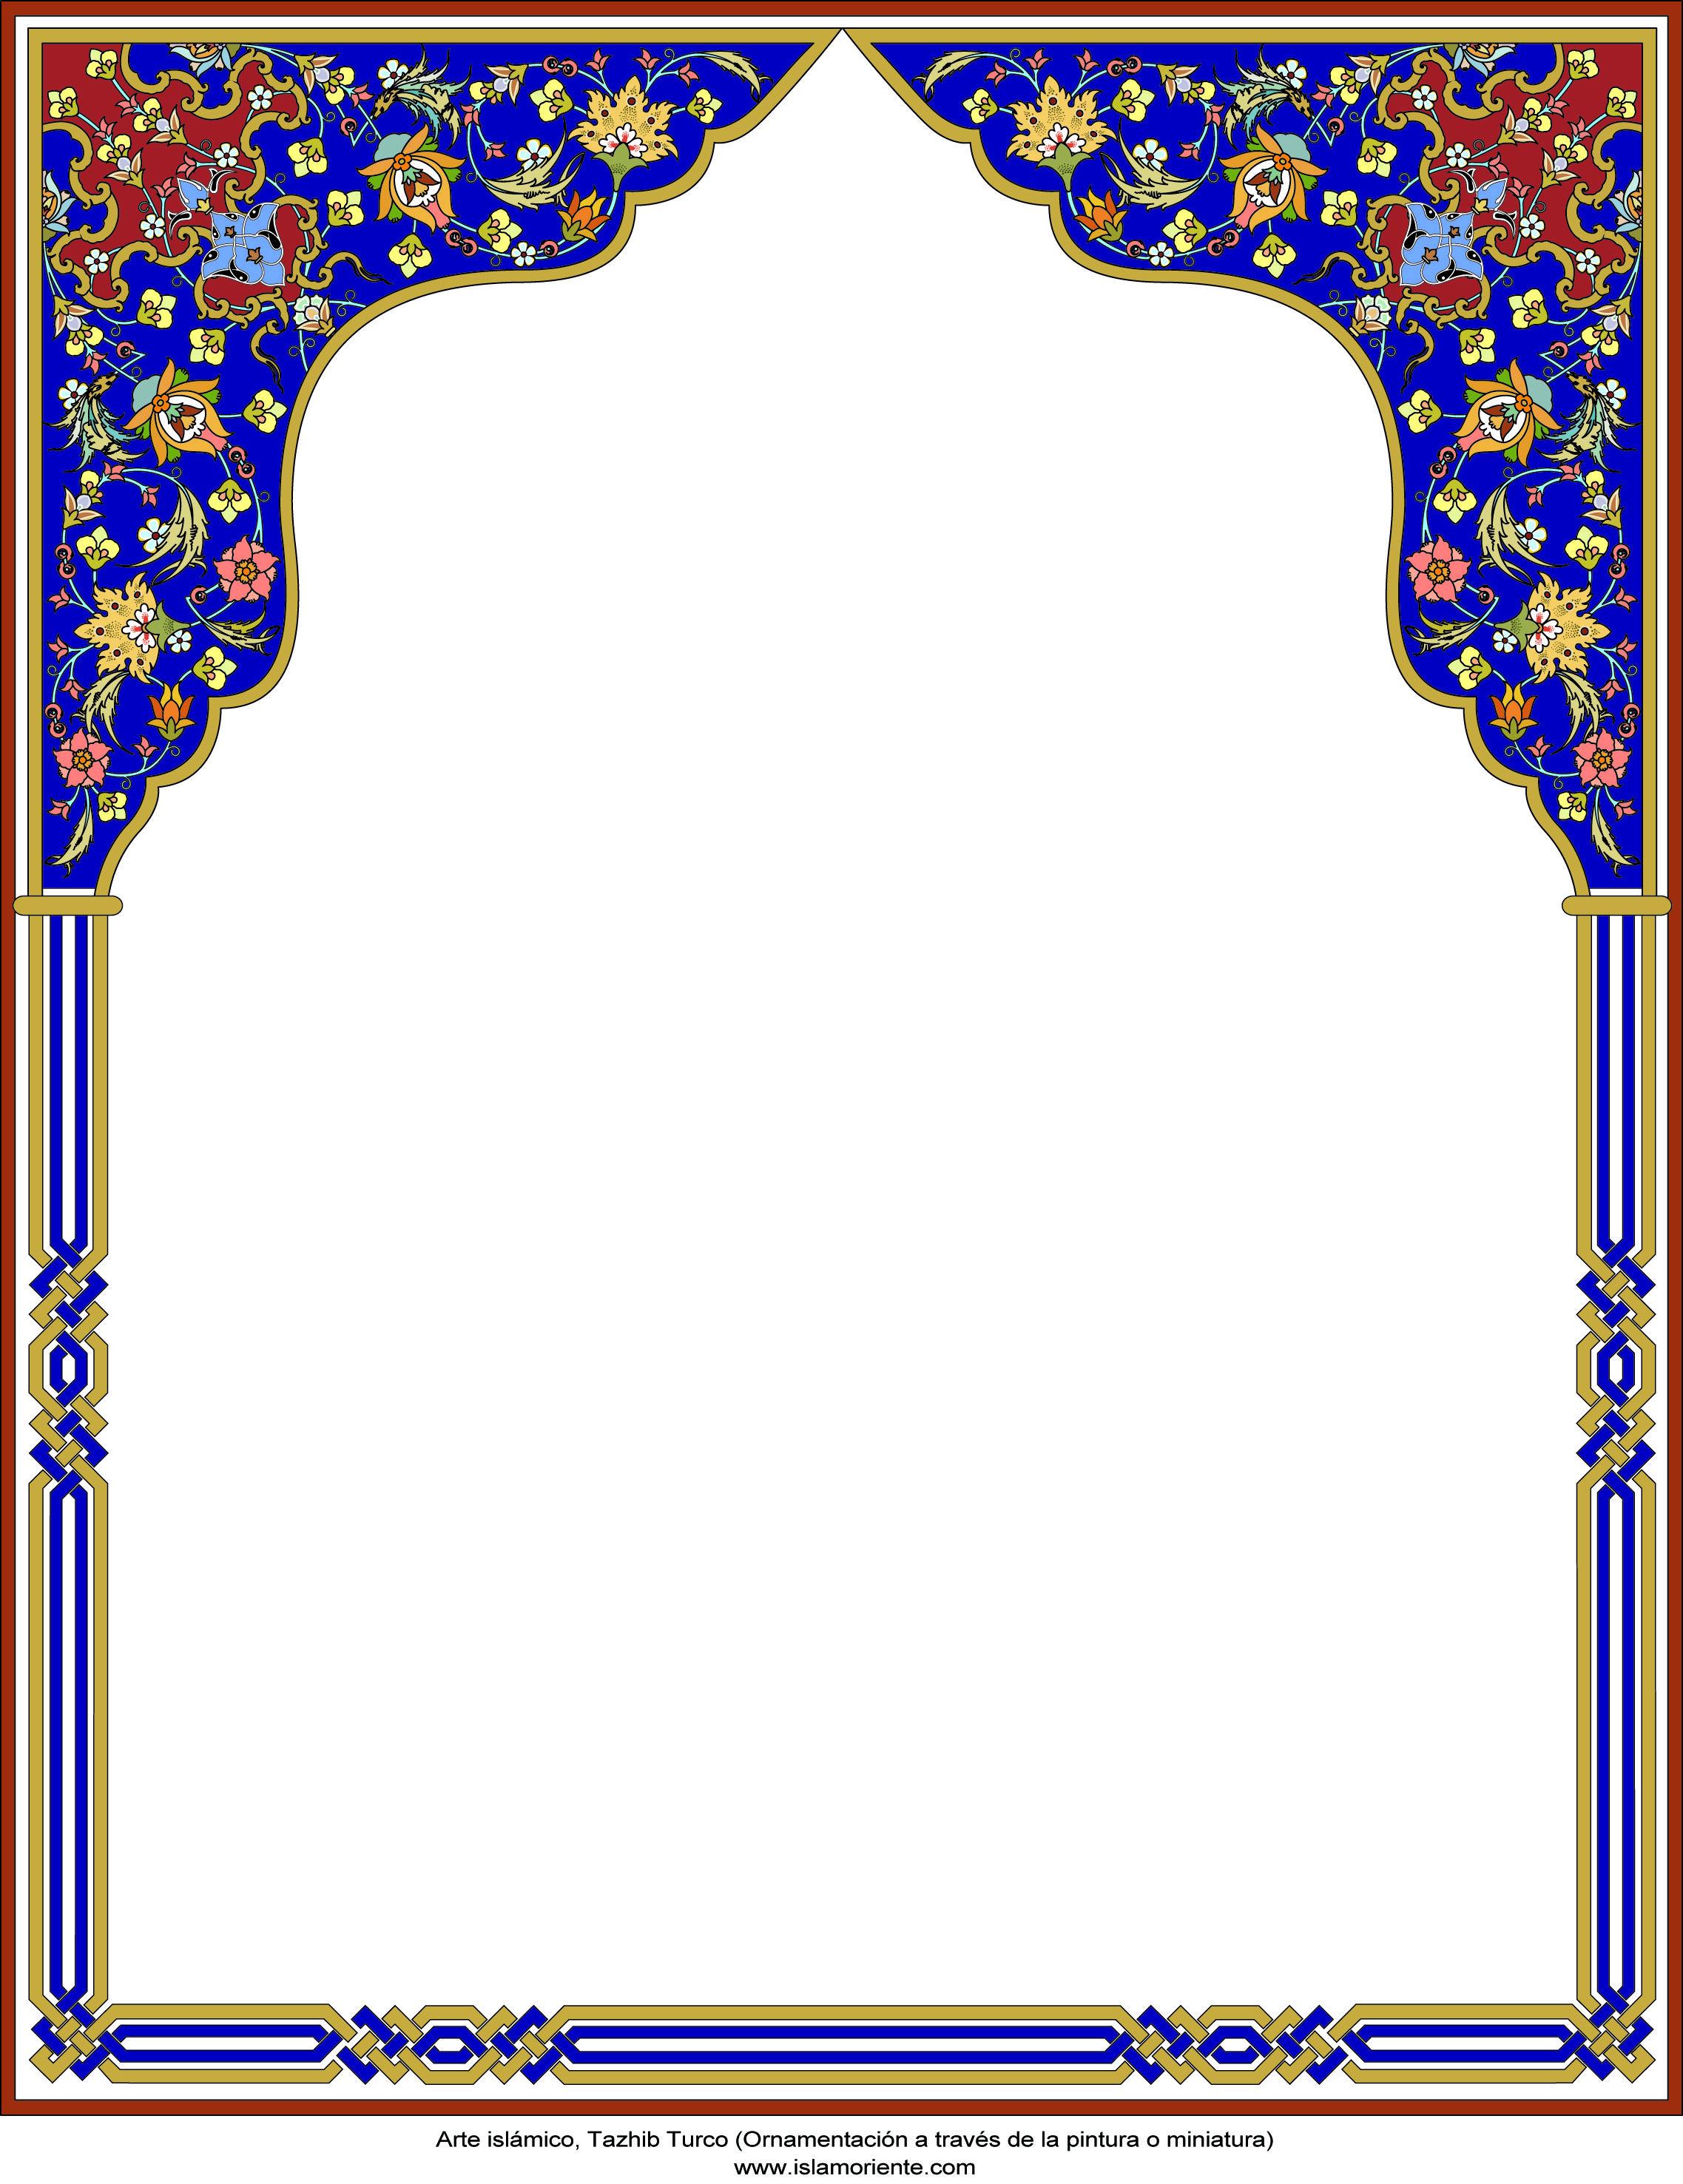 Royalty Free Borders Vectors